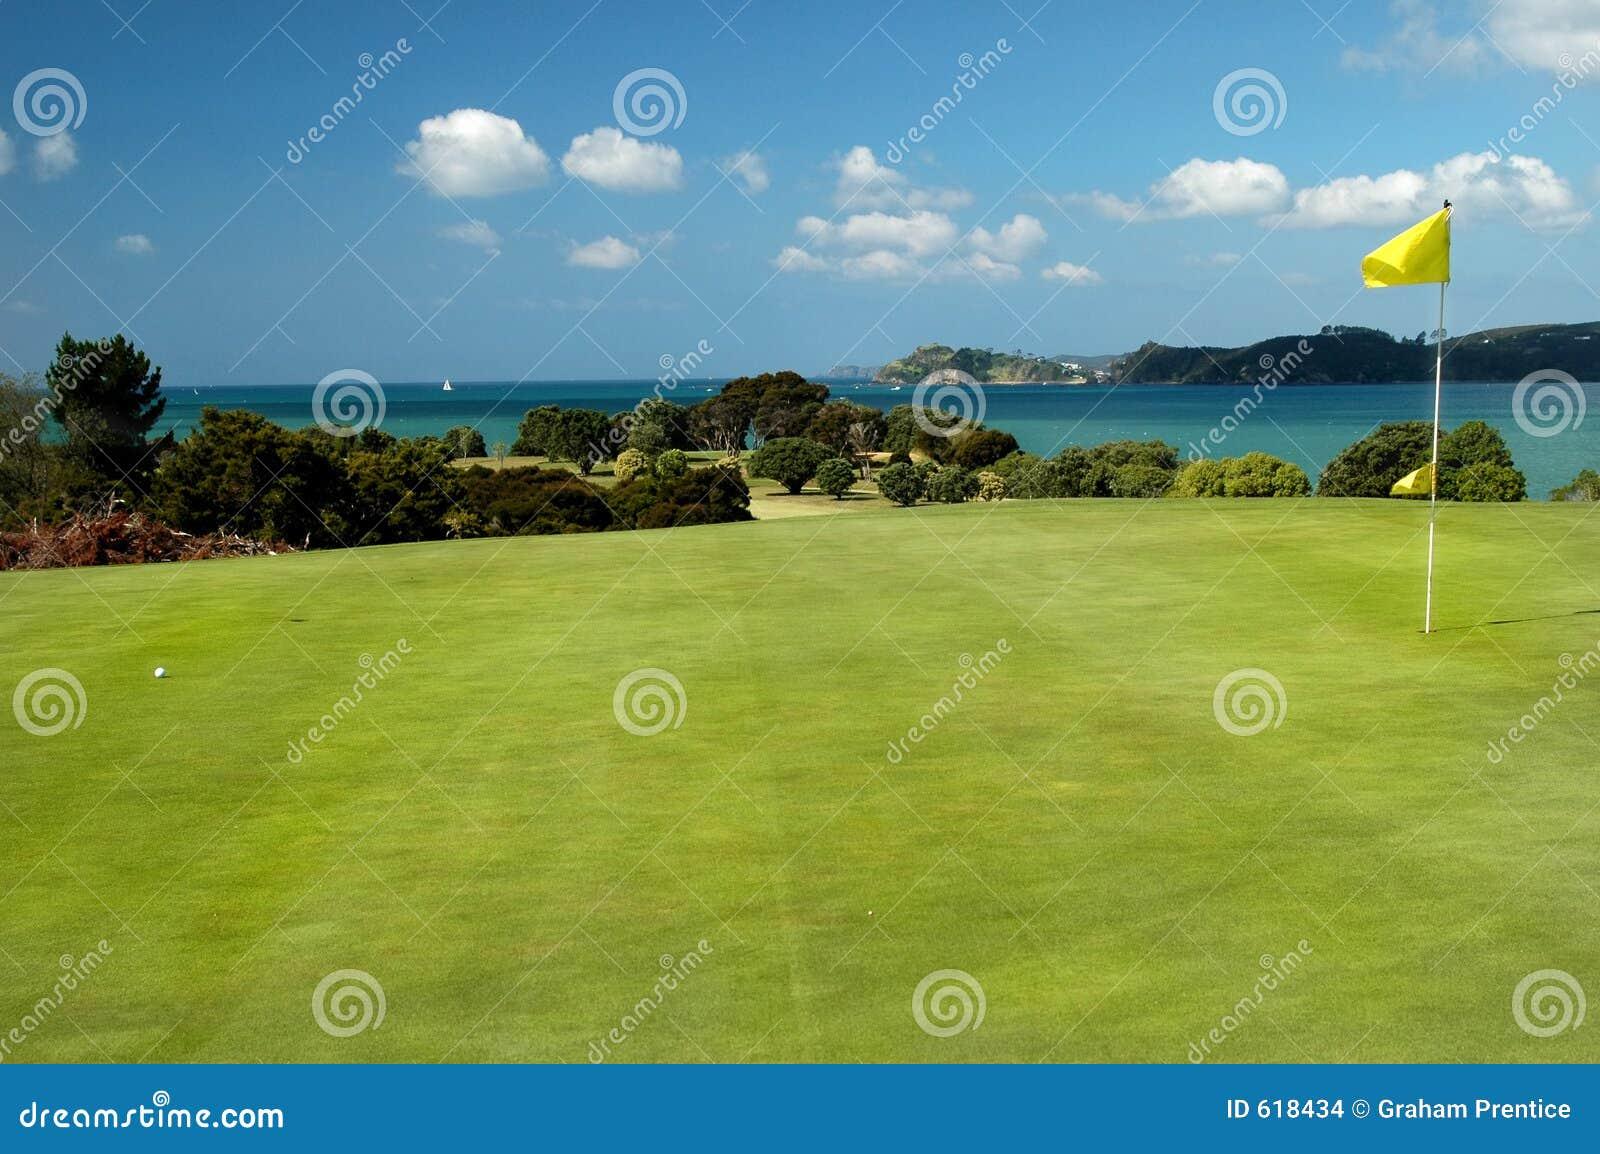 Golf - Gele Speld